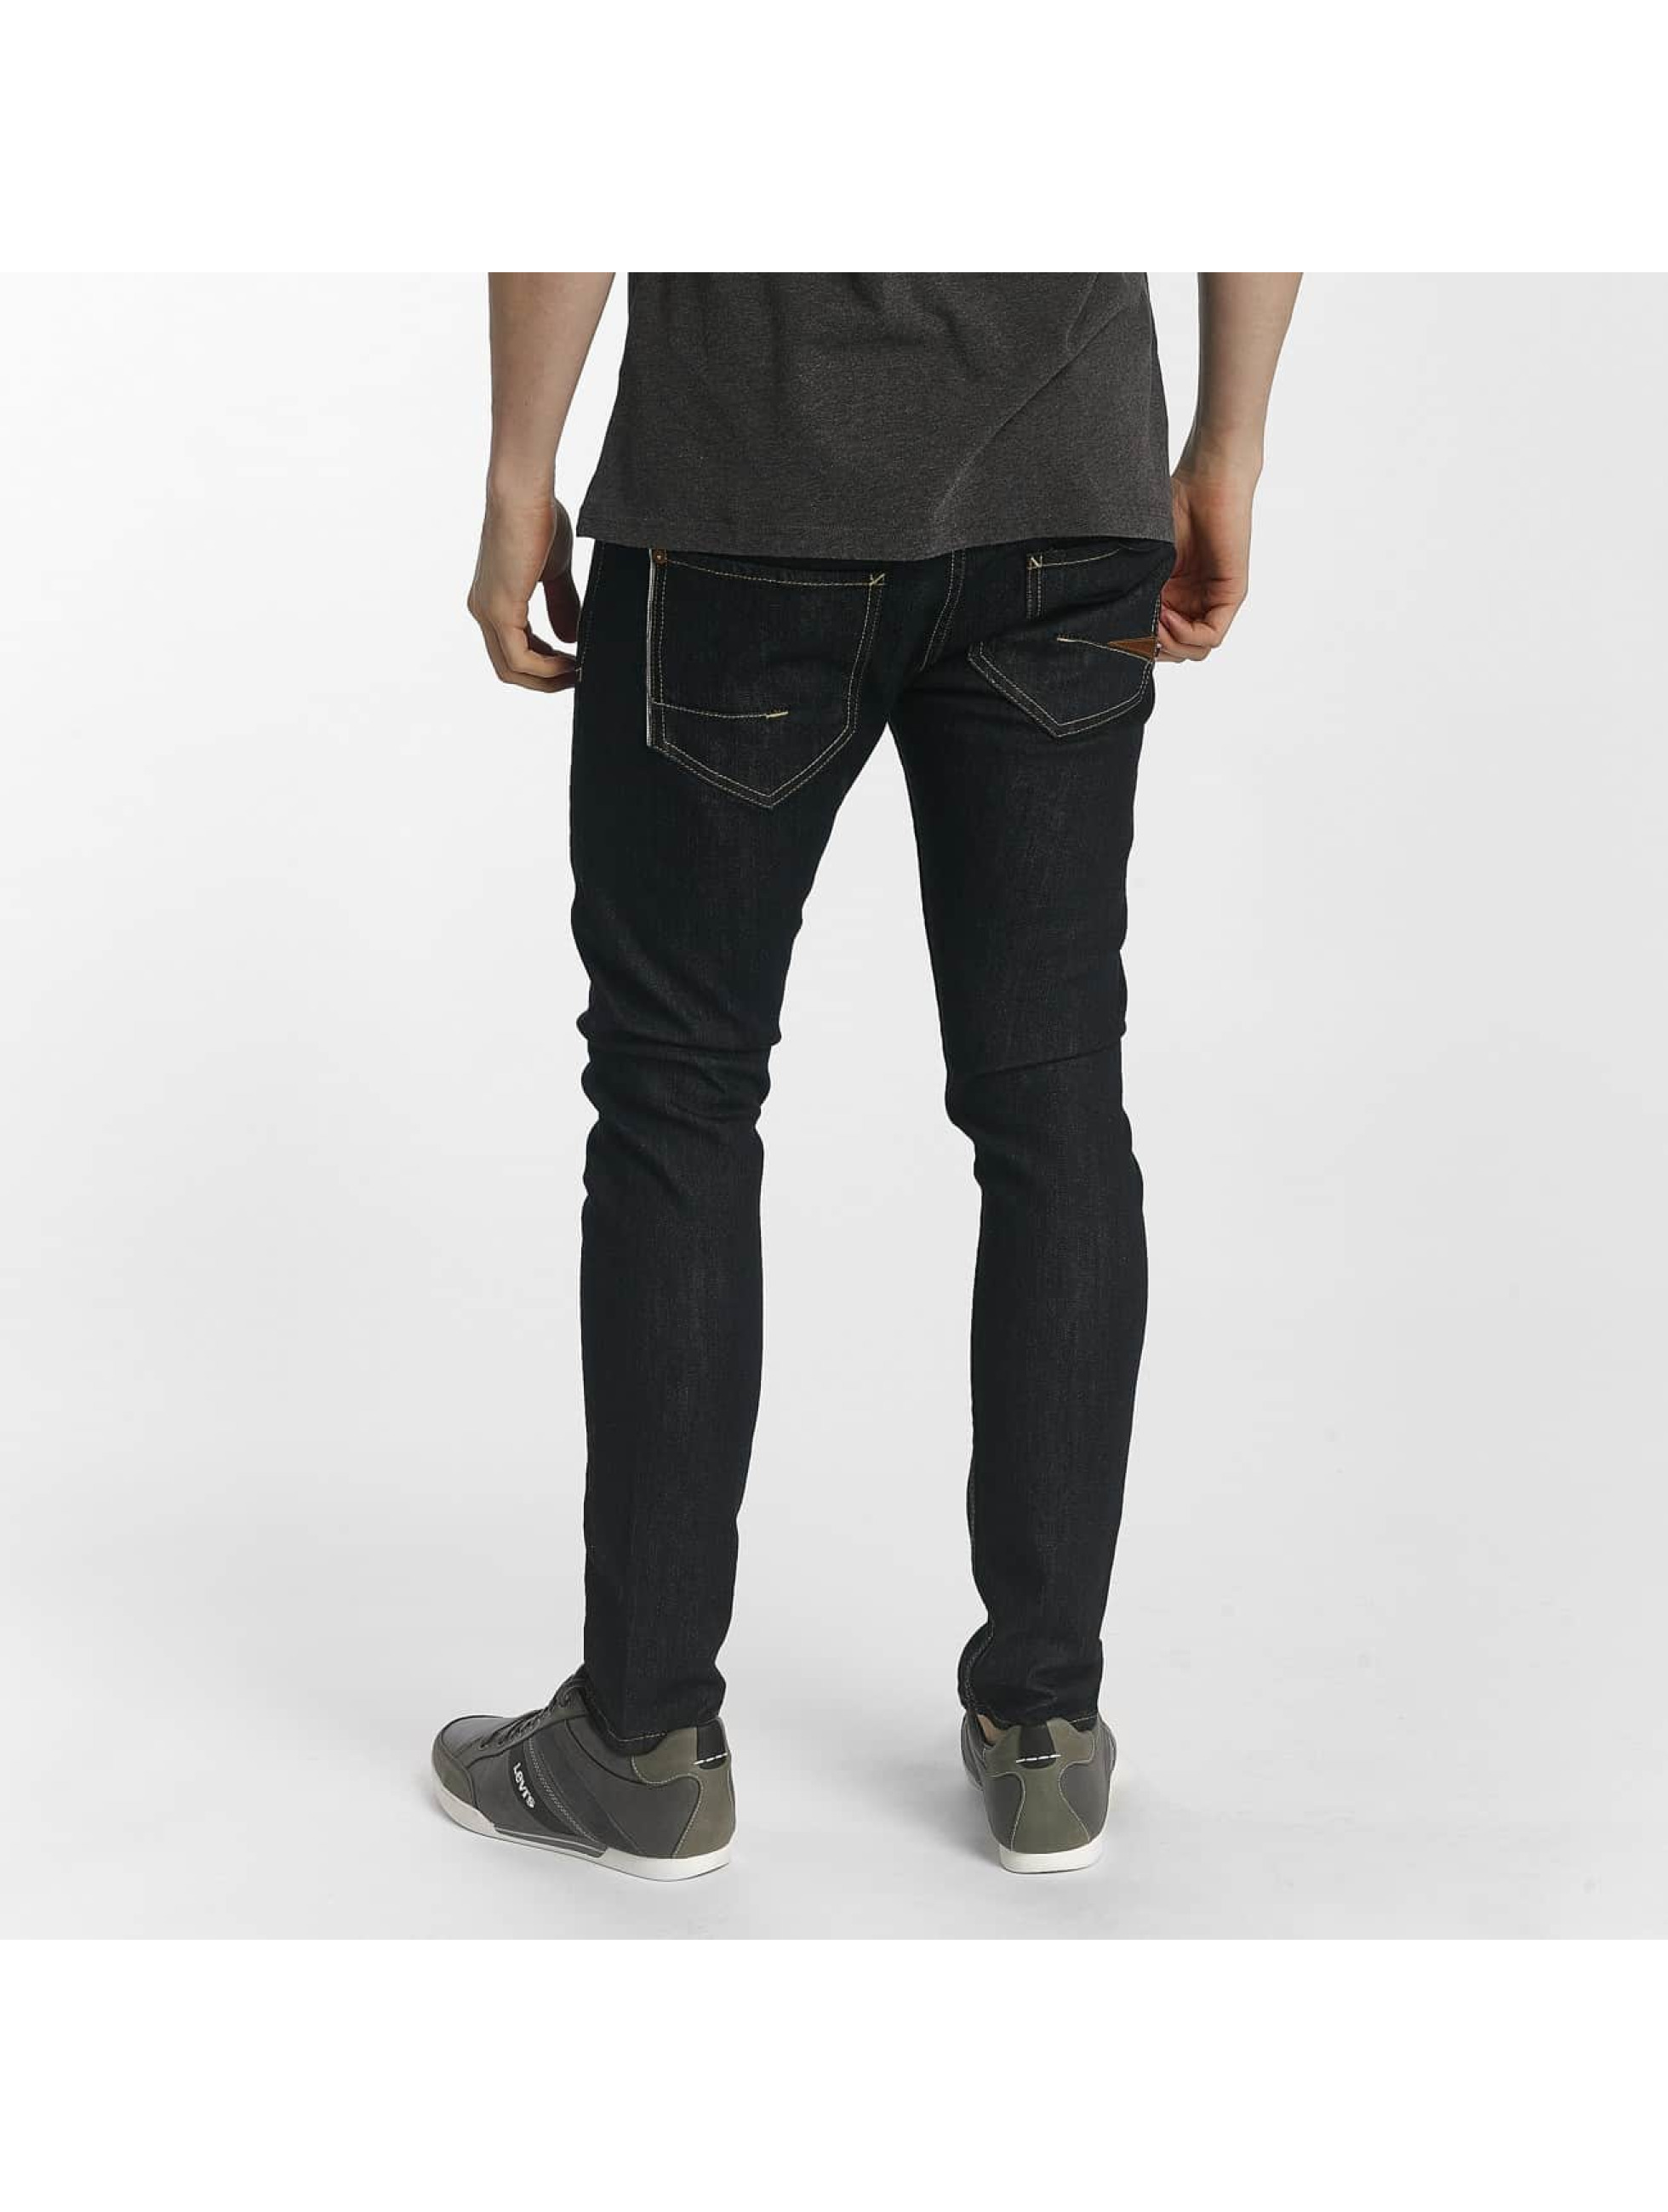 Le Temps Des Cerises Jeans ajustado 900/15 Conco azul